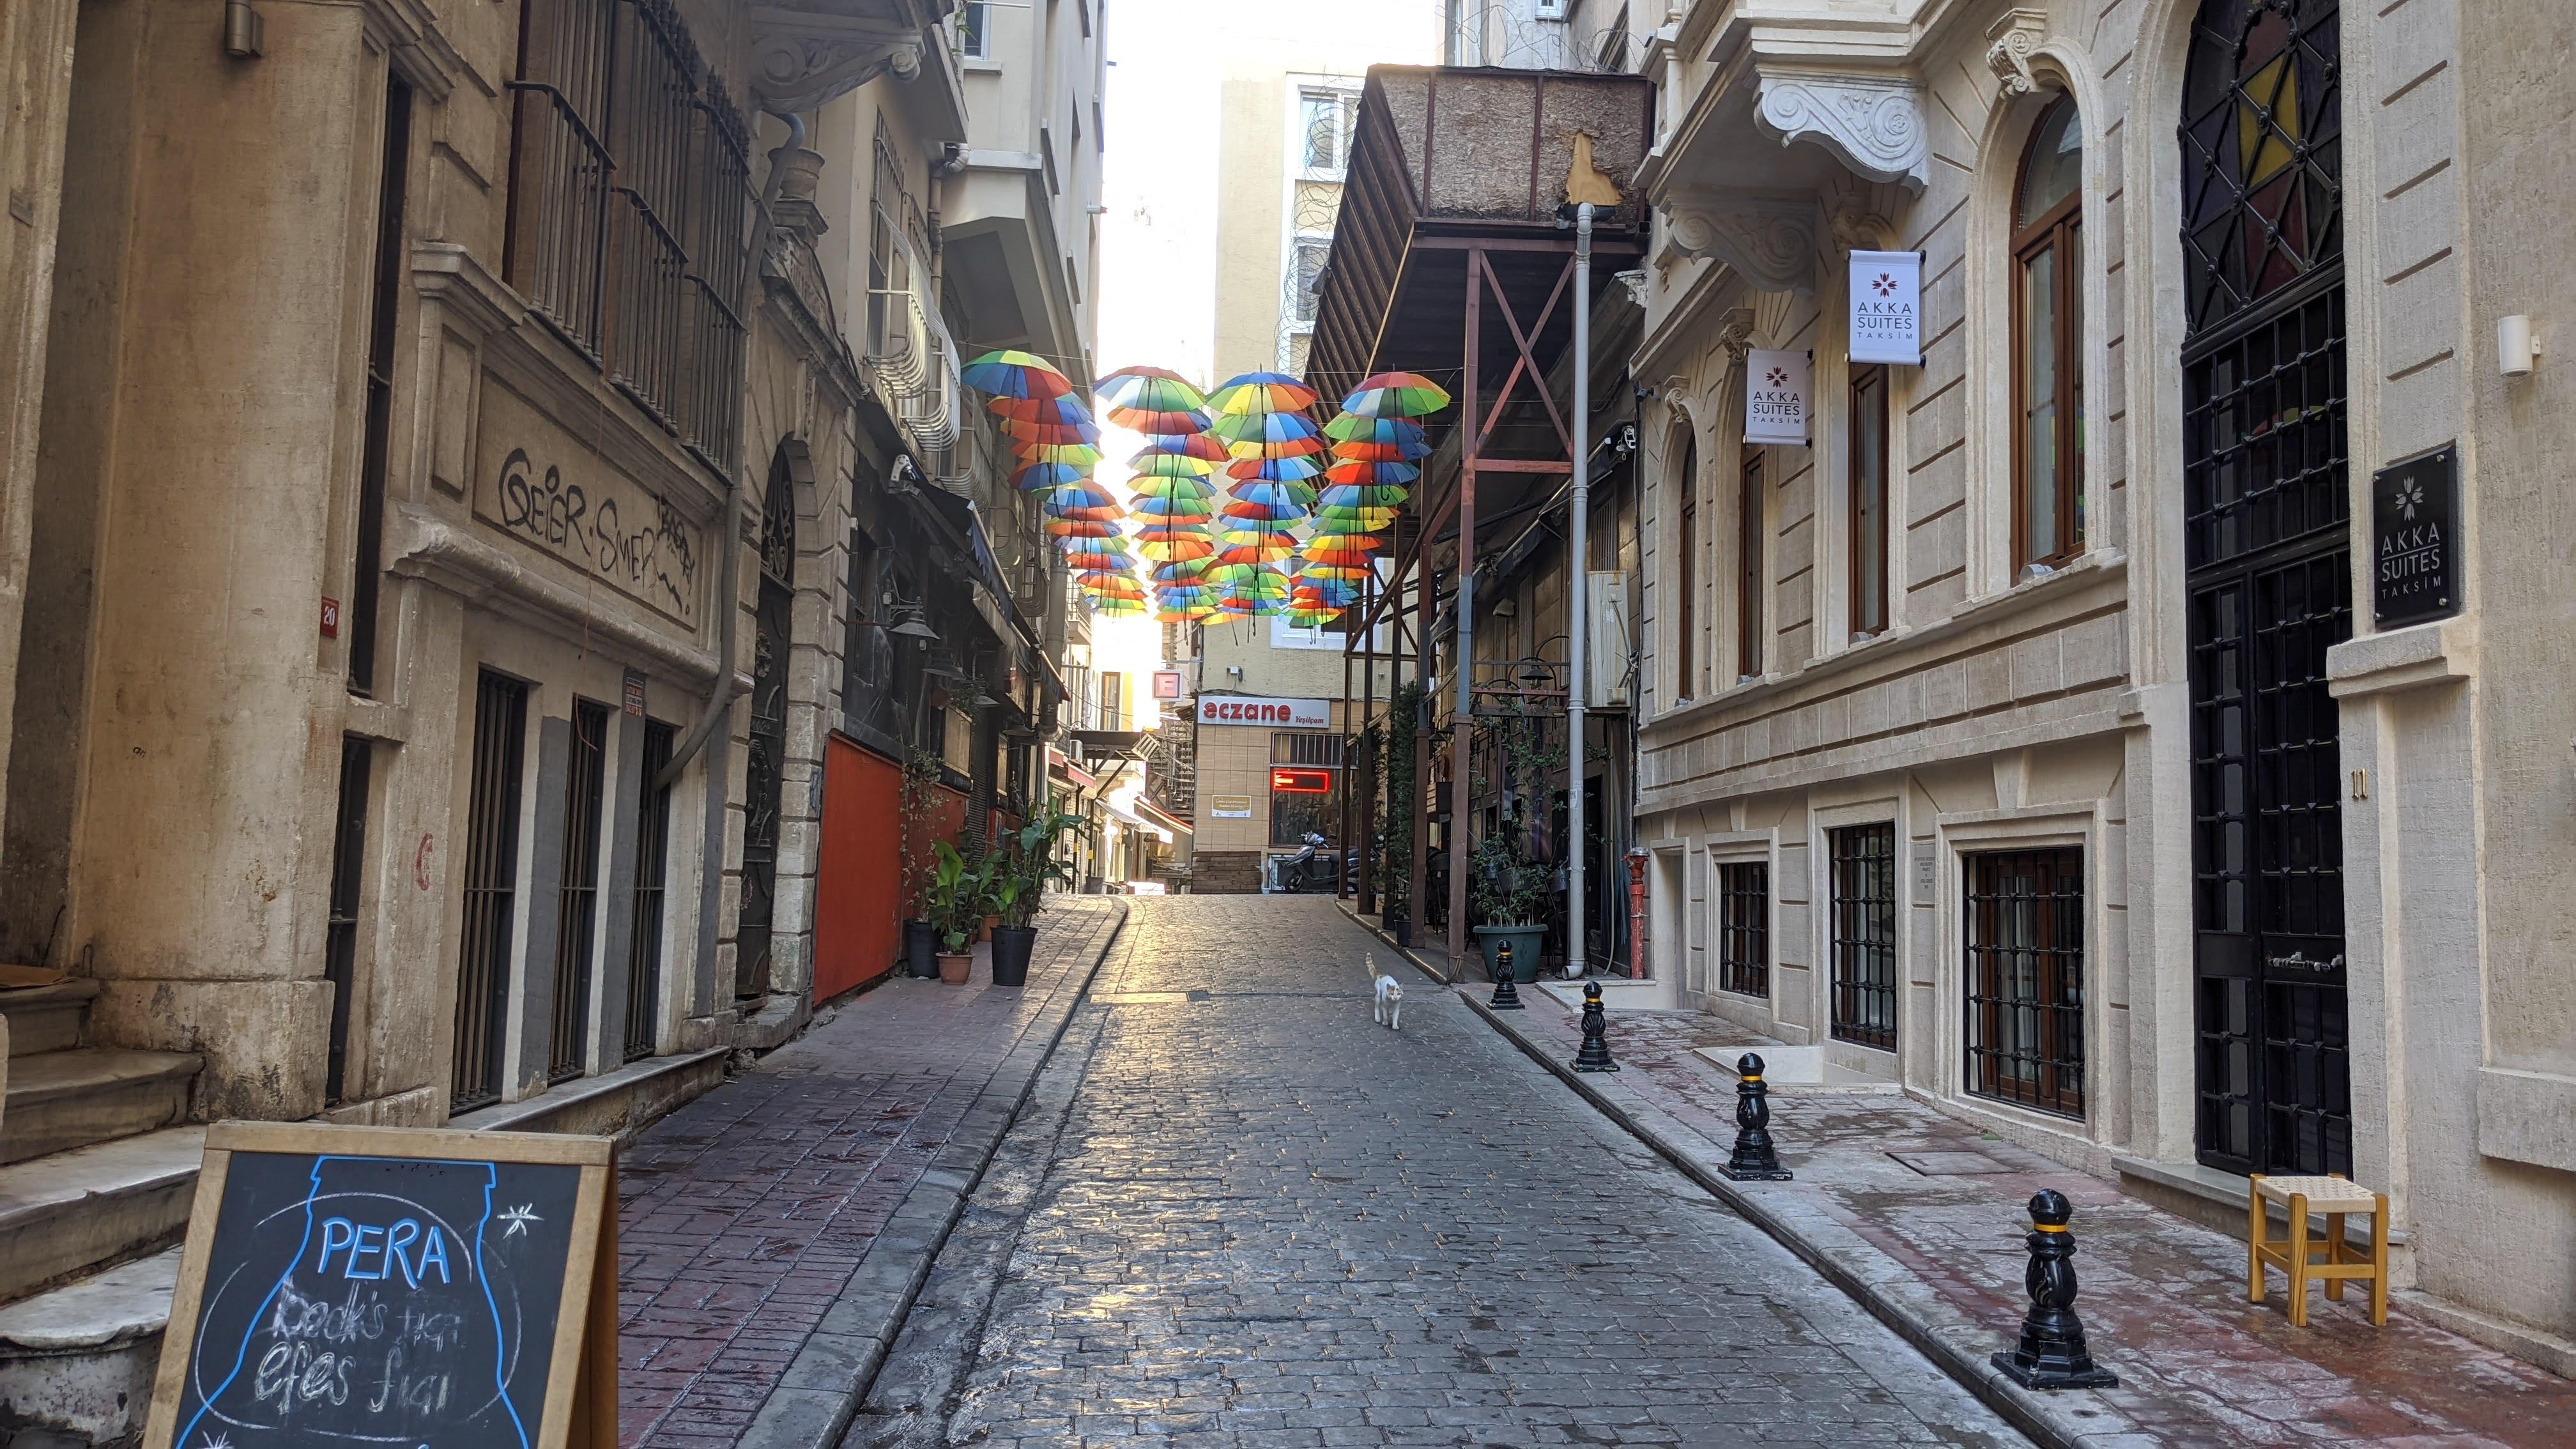 neat walk streets in istanbul turkey with umbrella decoration